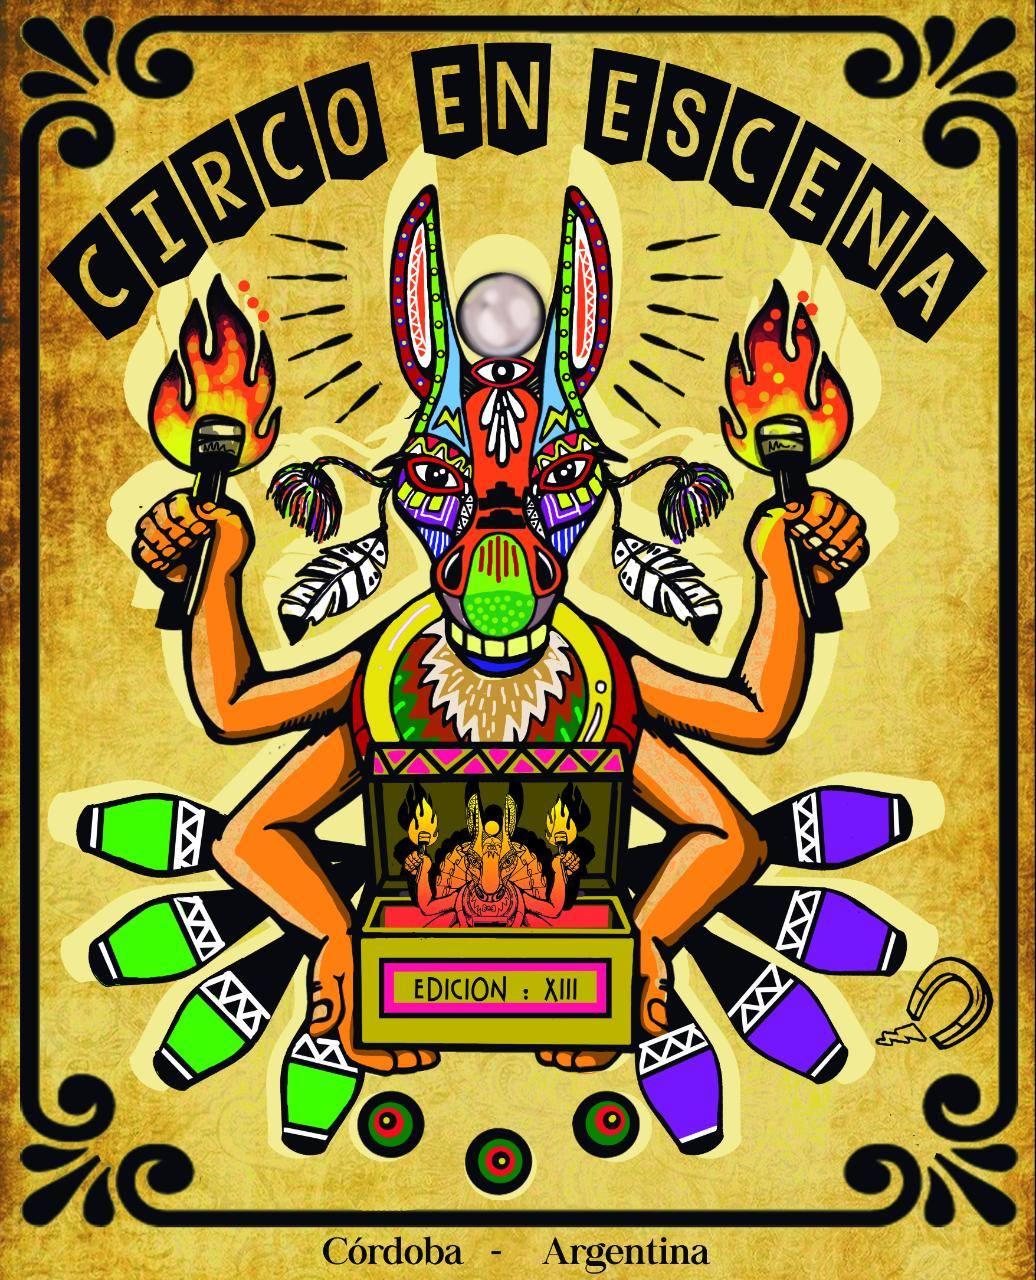 Circo en escena, Argentina (2019)